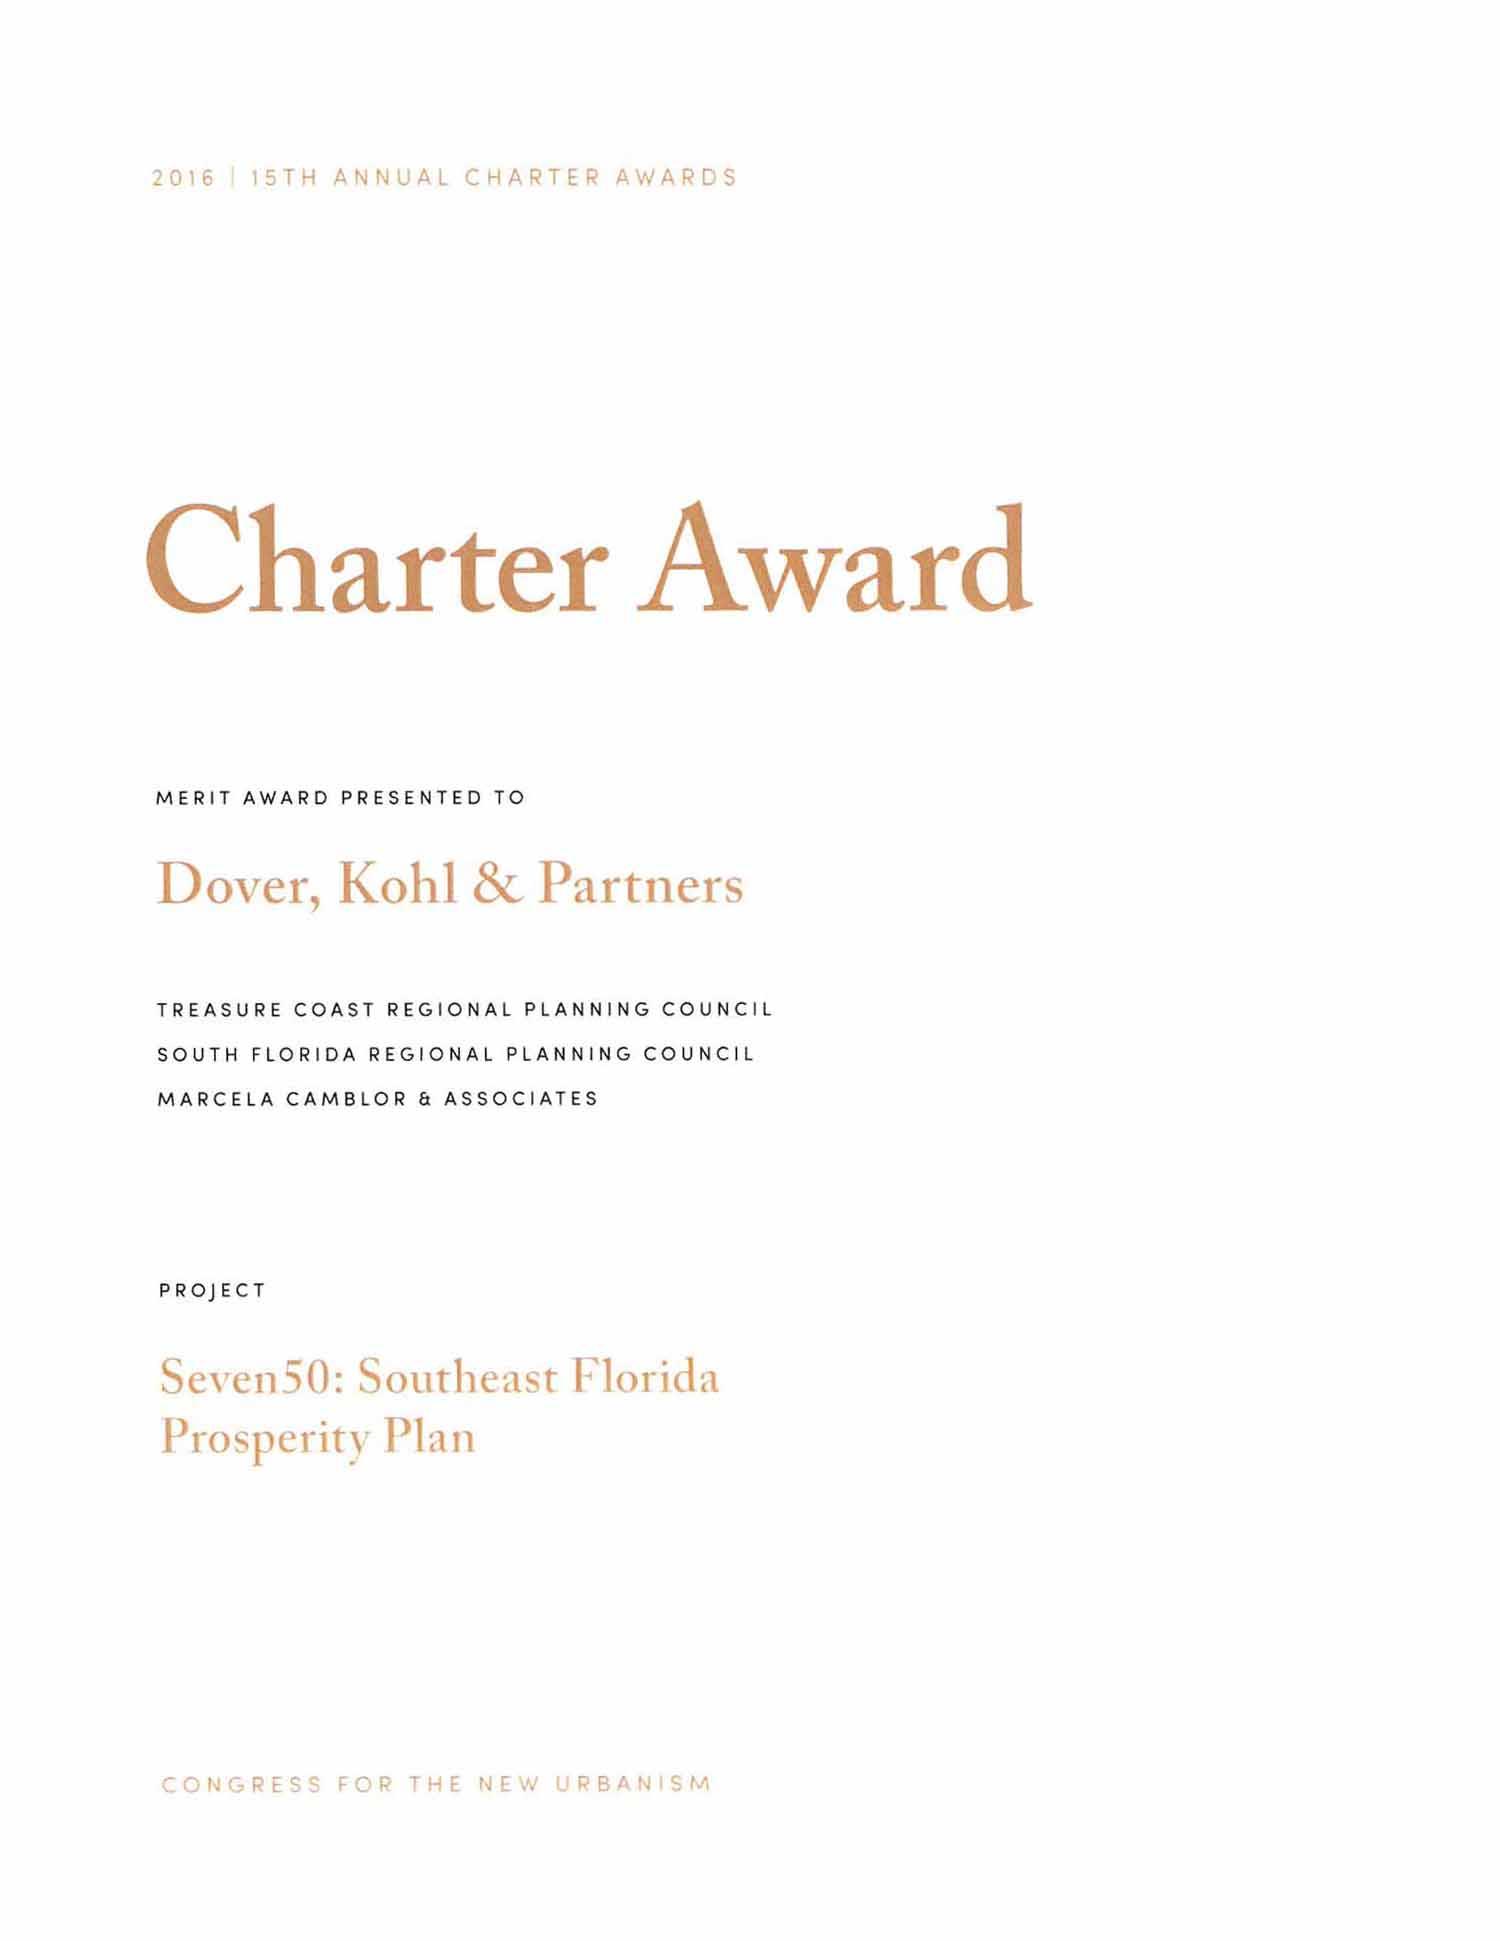 2016 Charter Award- Seven50 Southeast Florida Prosperity Plan.jpg